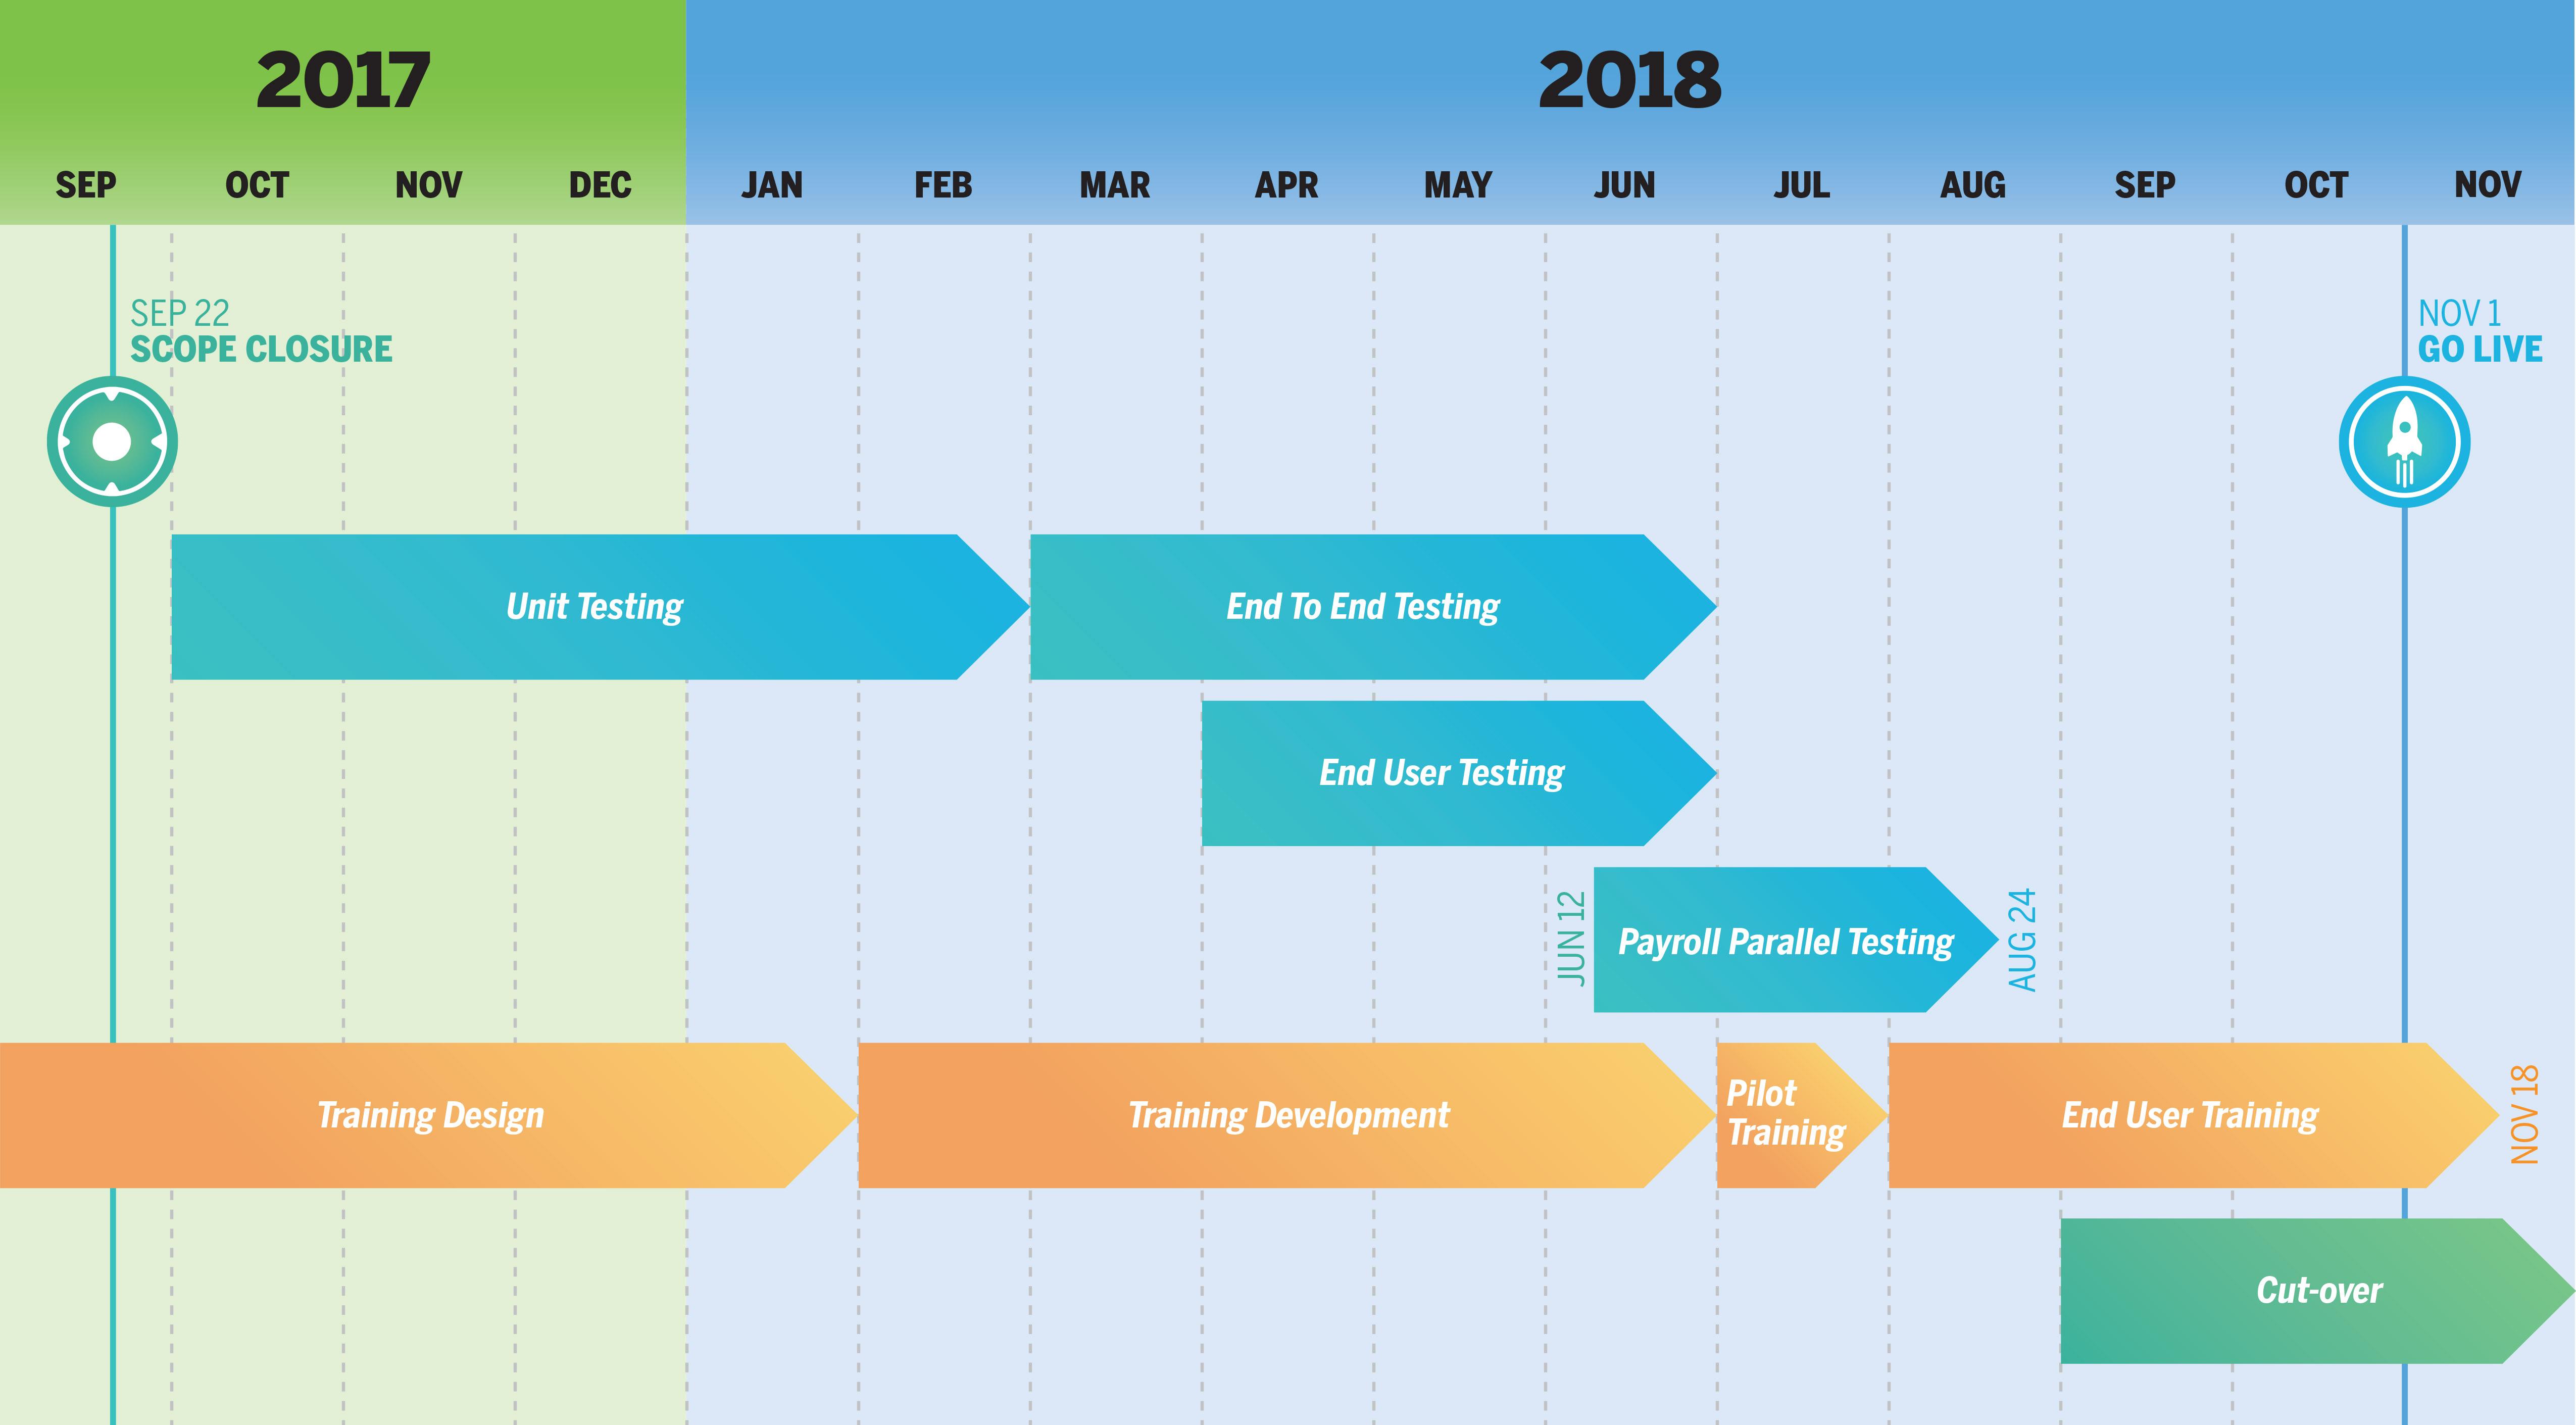 Workday Timeline HIGH LEVEL v2 jpg | Workday | The University of